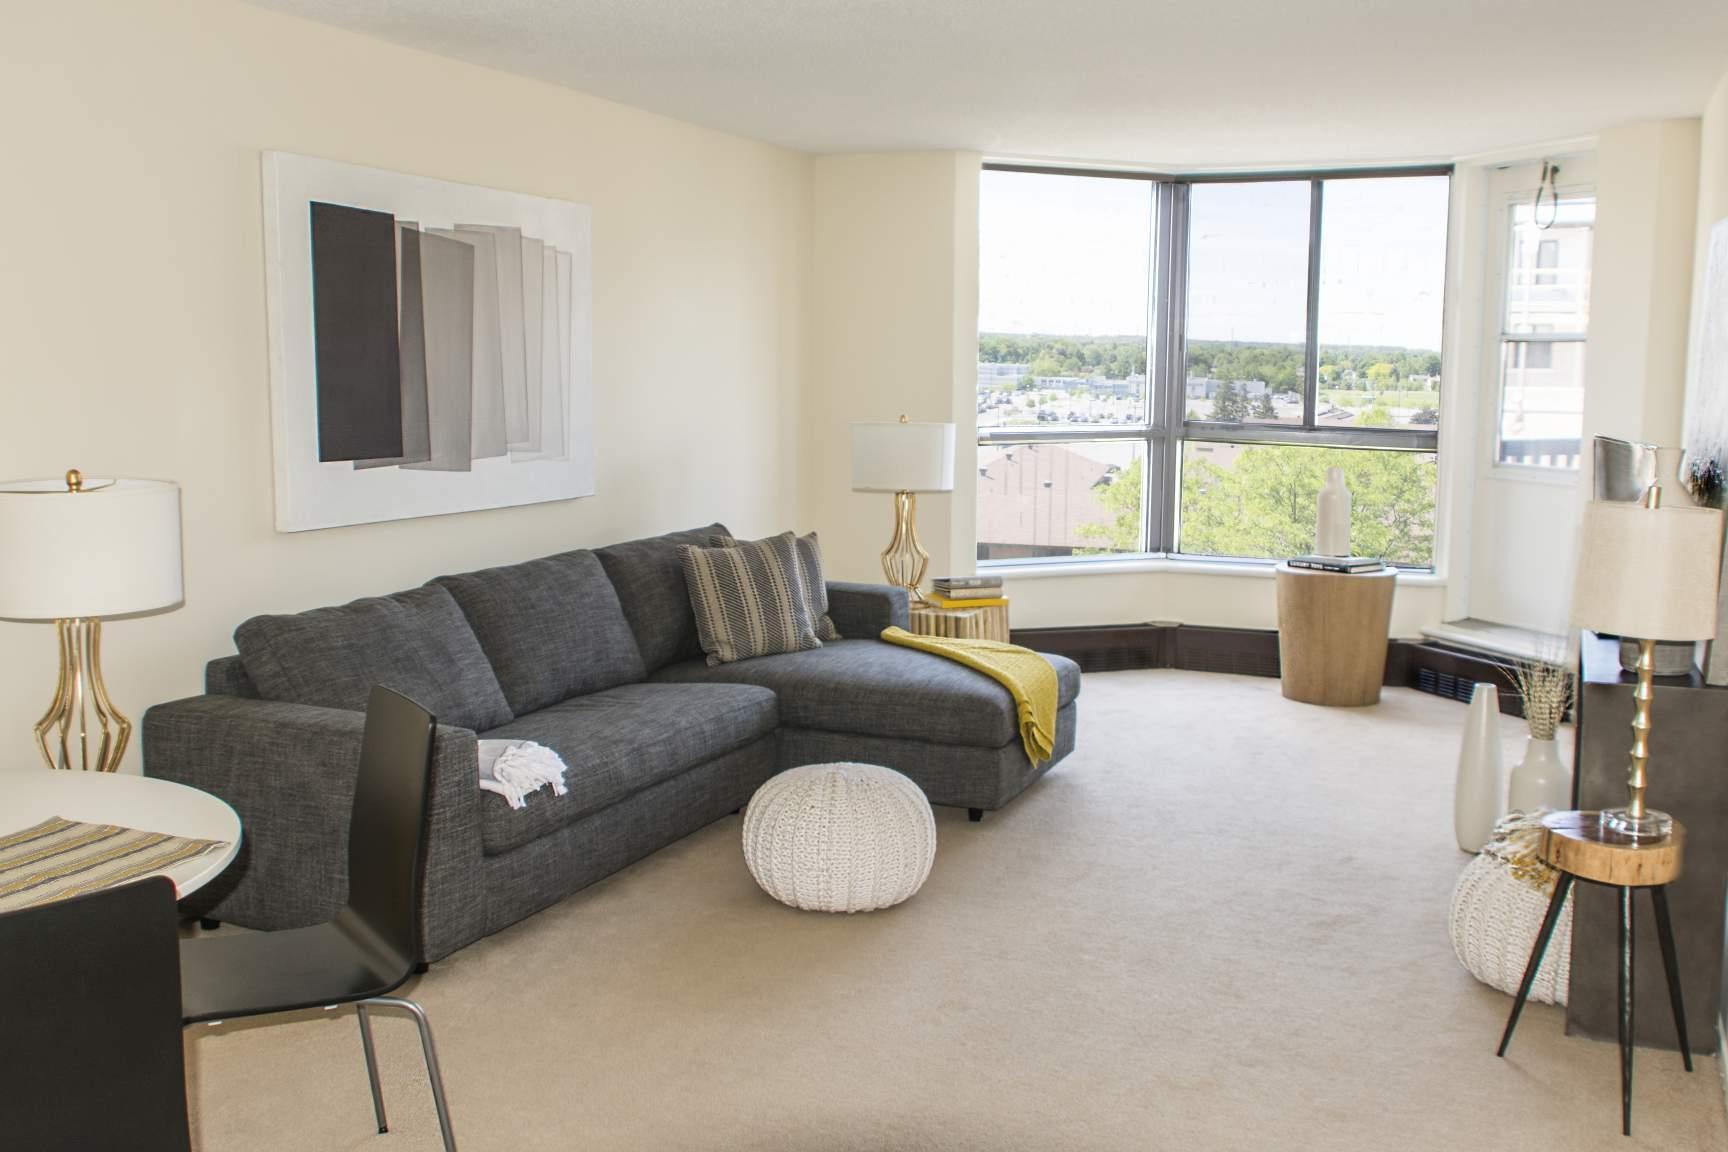 The Aventura Apartments Photo #1